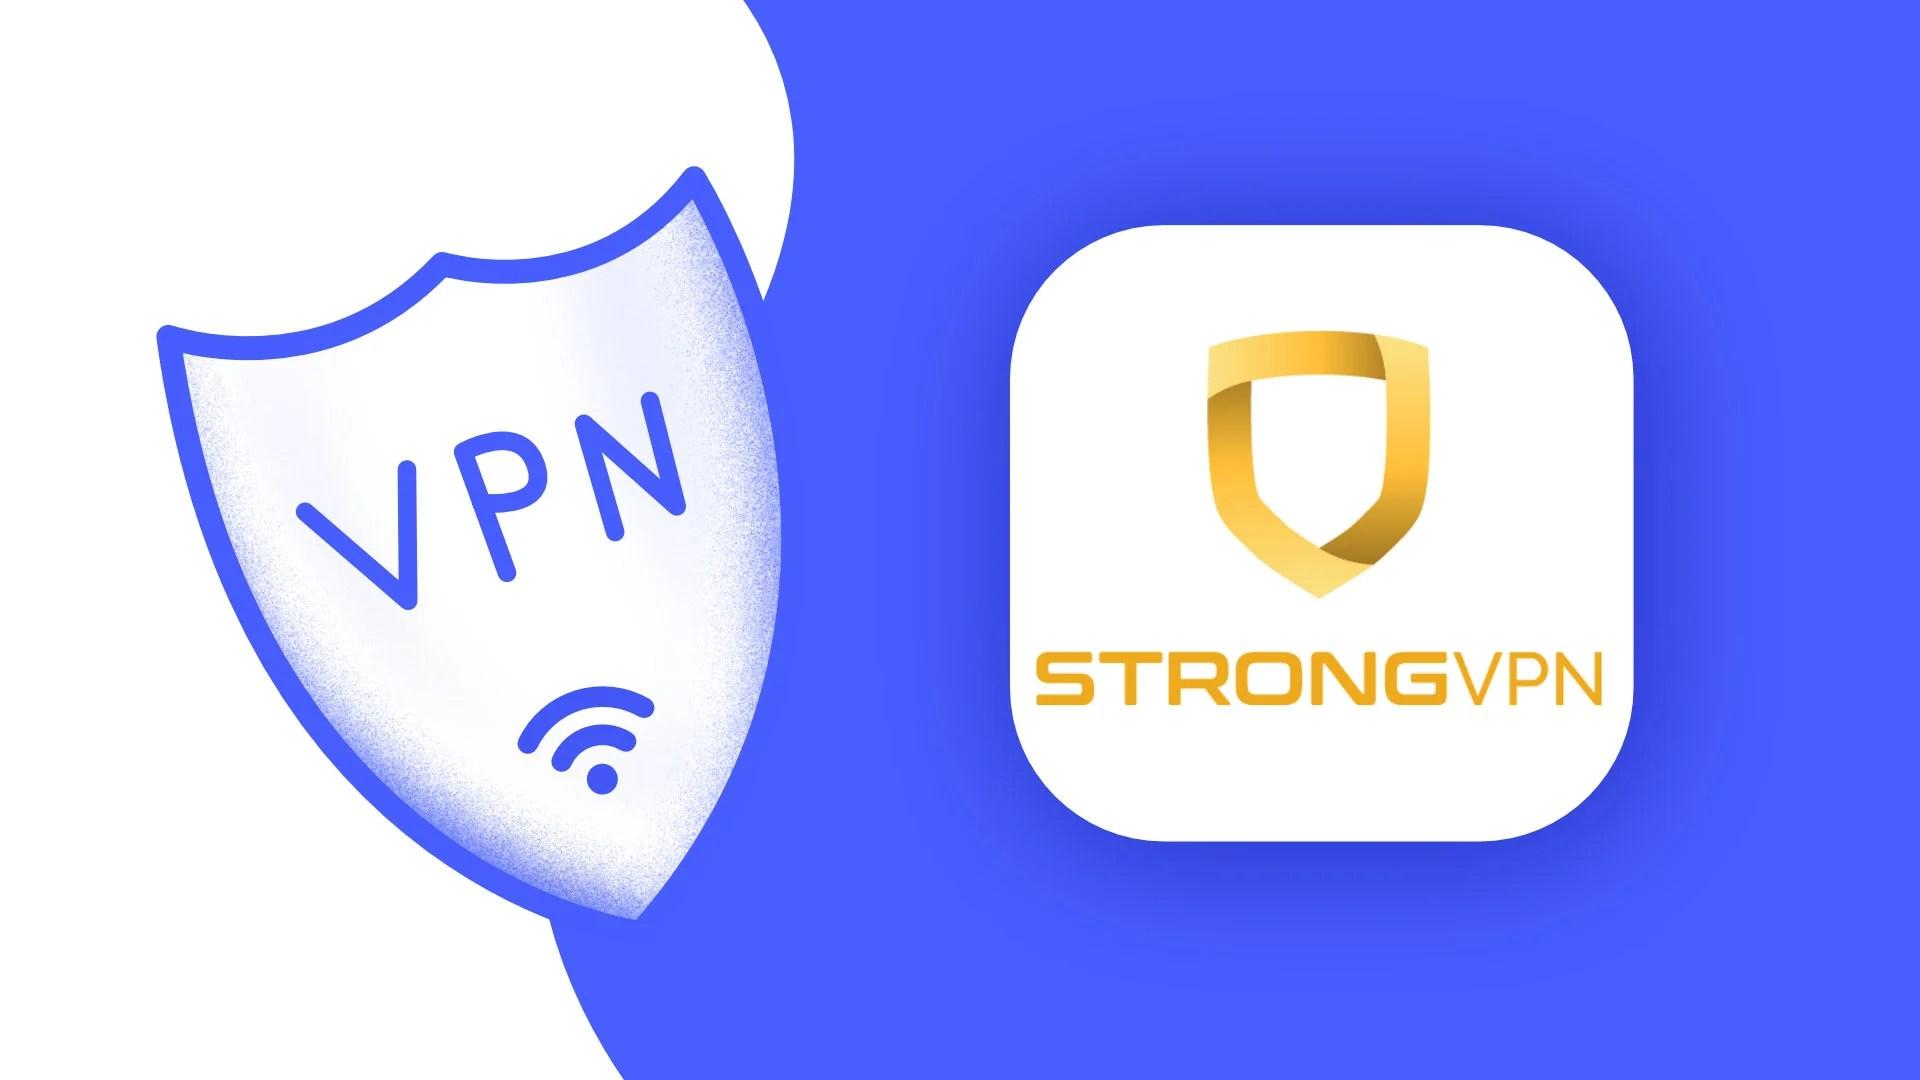 StrongVPN : notre avis sur ce VPN